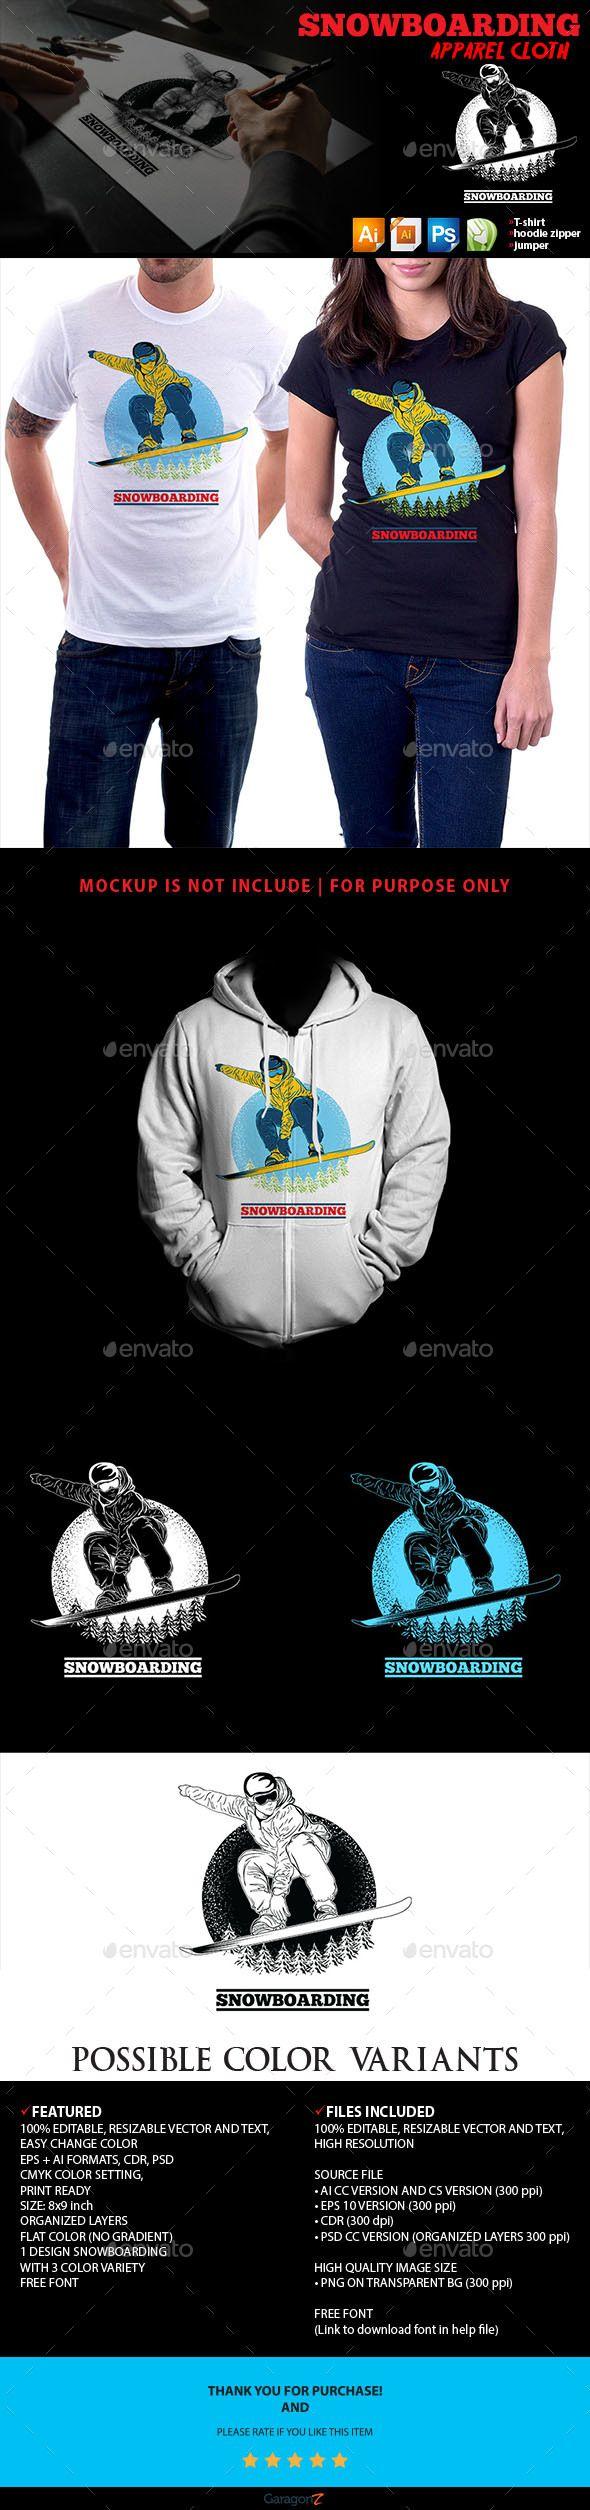 Snowboarding Apparel Cloth - Sports & Teams T-Shirts